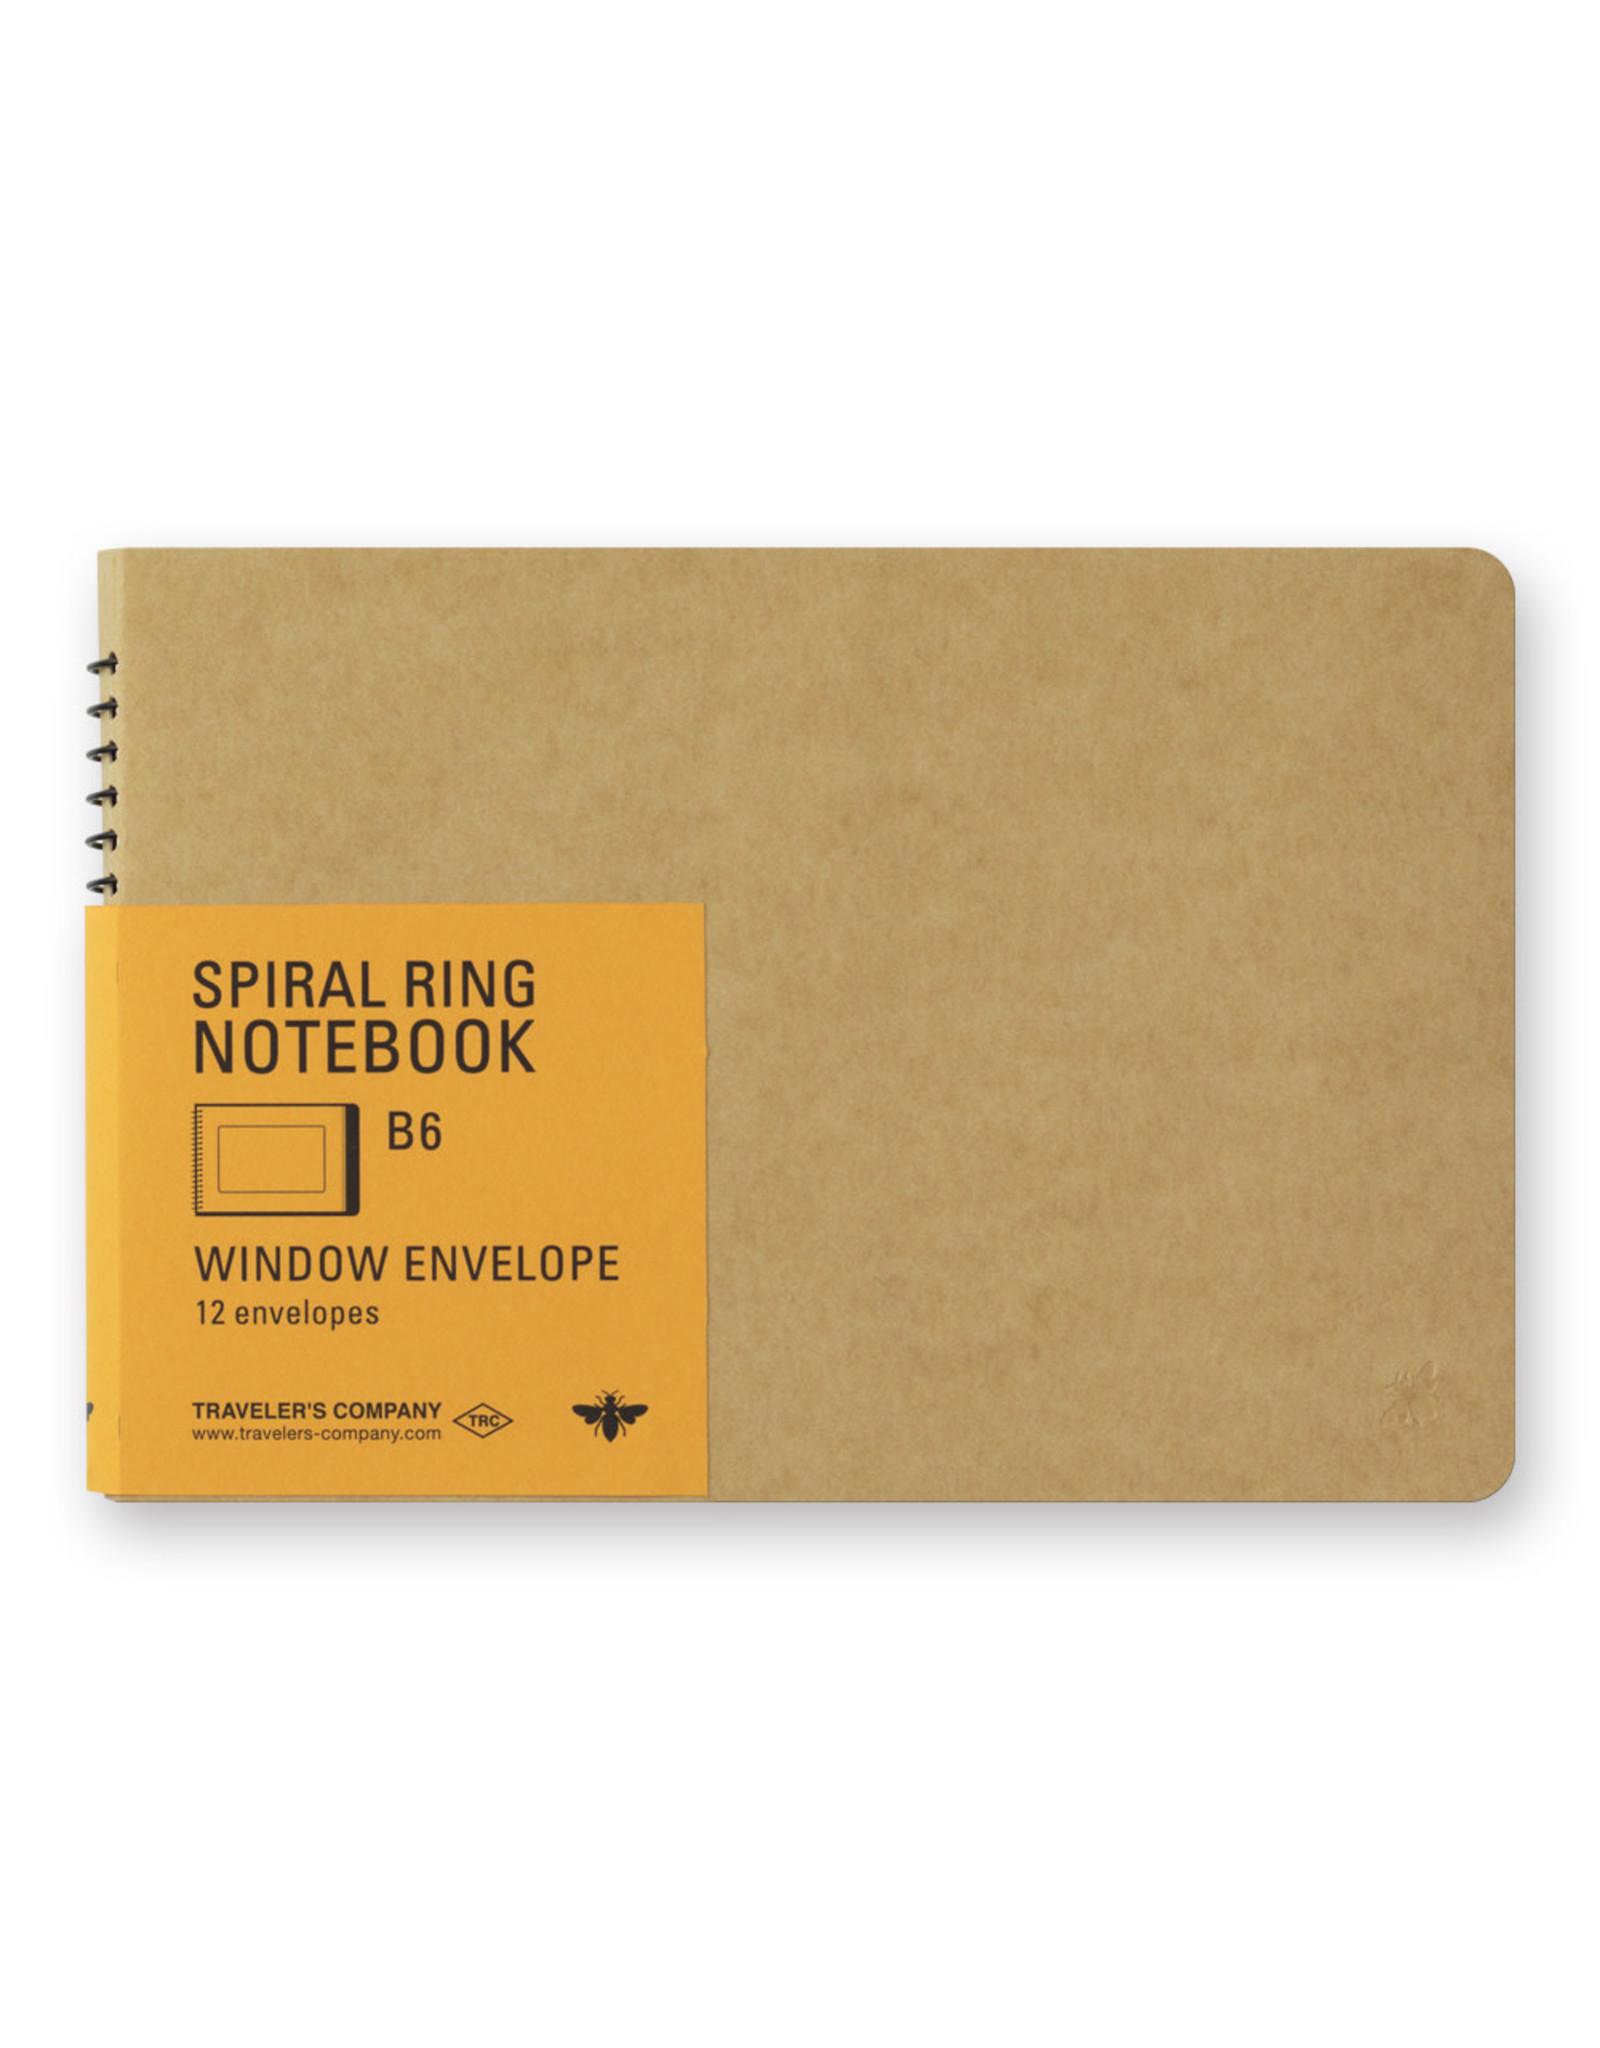 Traveler's Company SPIRAL RING NOTEBOOK B6 WINDOW ENVELOP 12 ENVELOPES